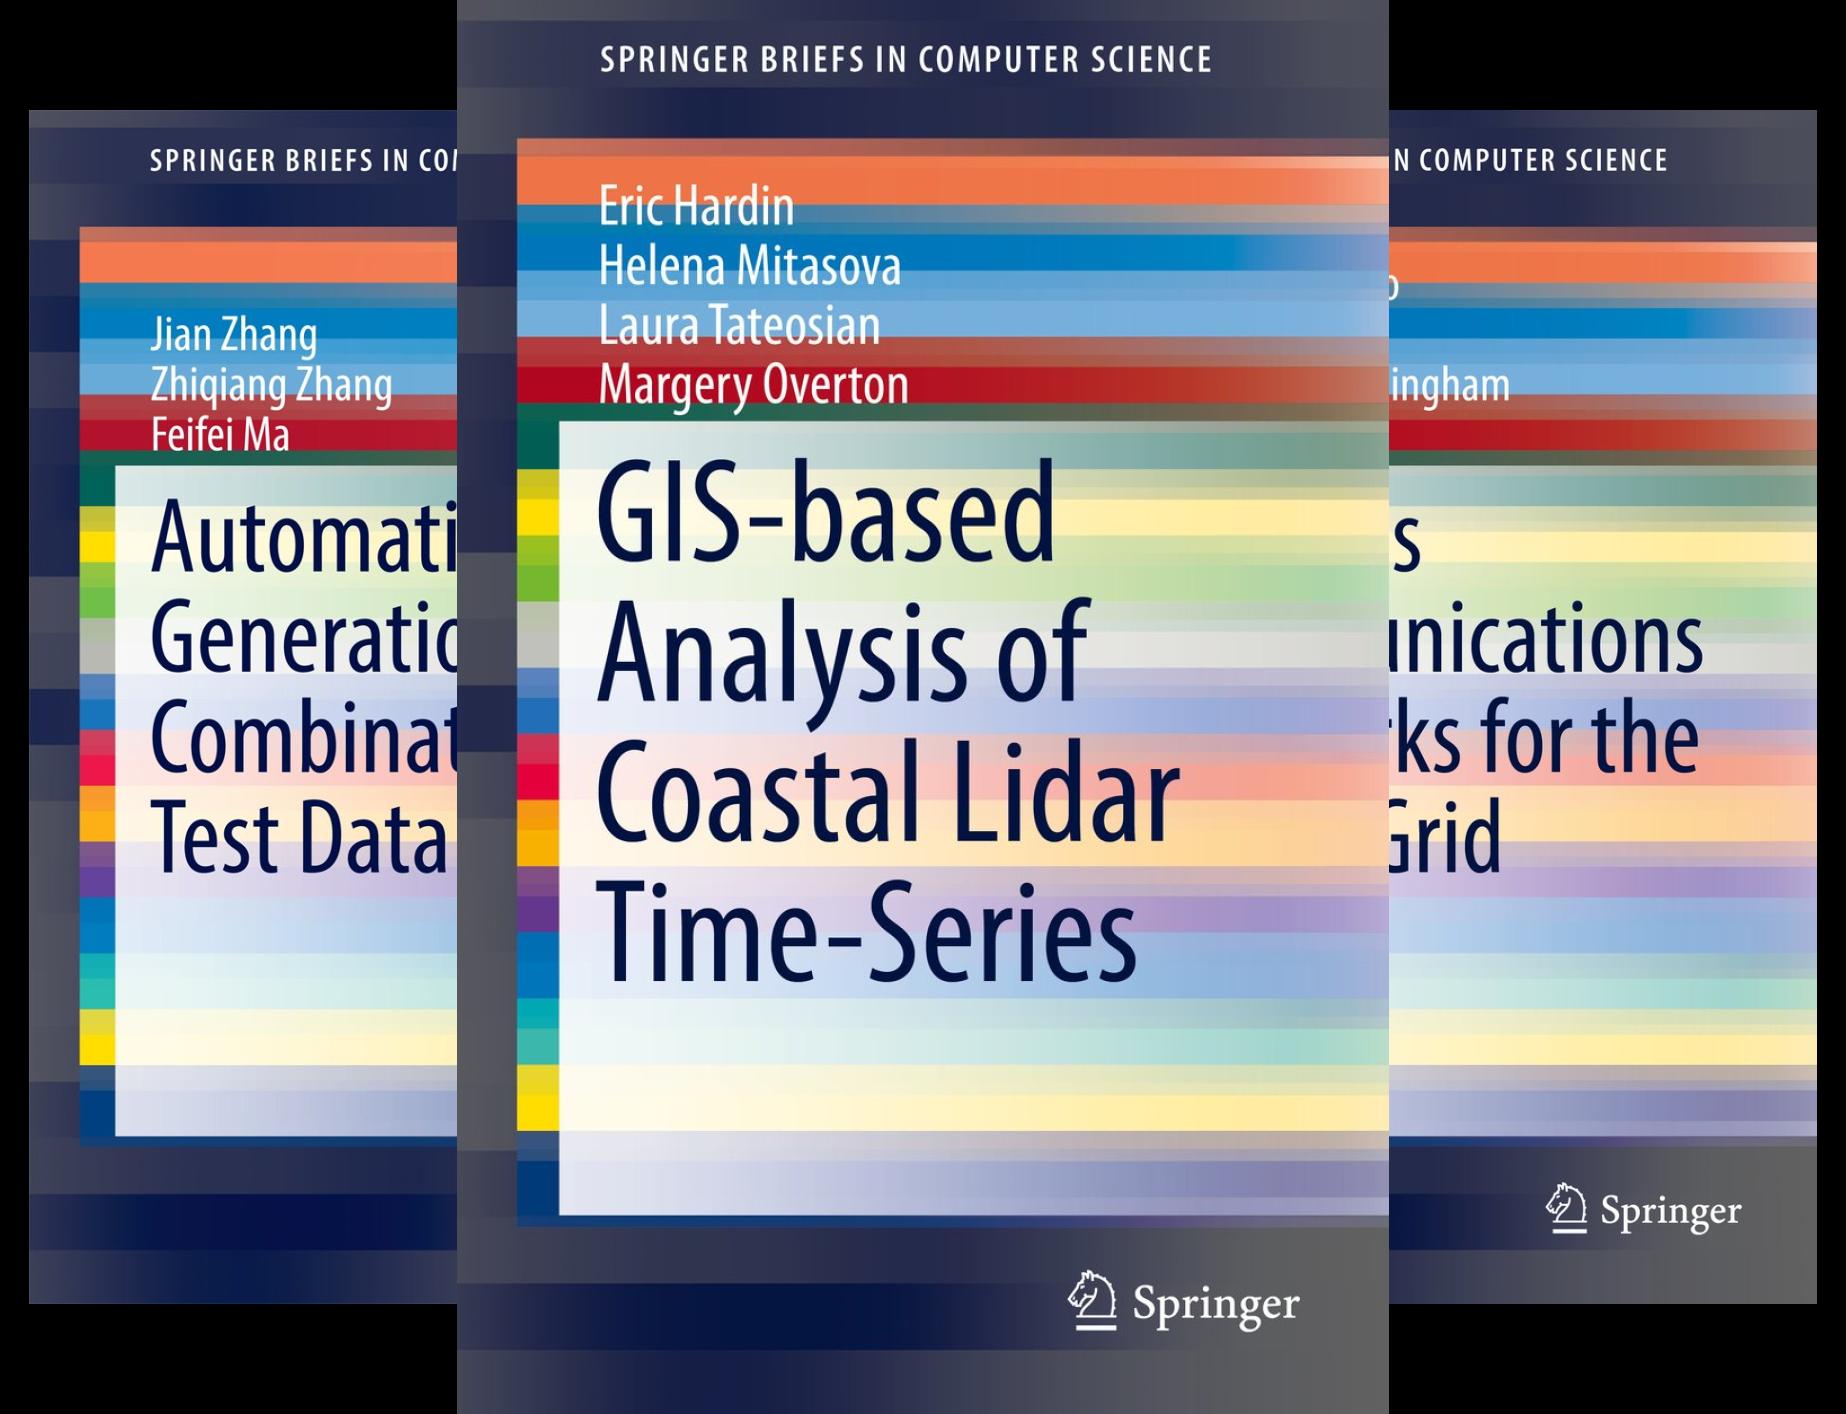 SpringerBriefs in Computer Science (151-200) (50 Book Series)